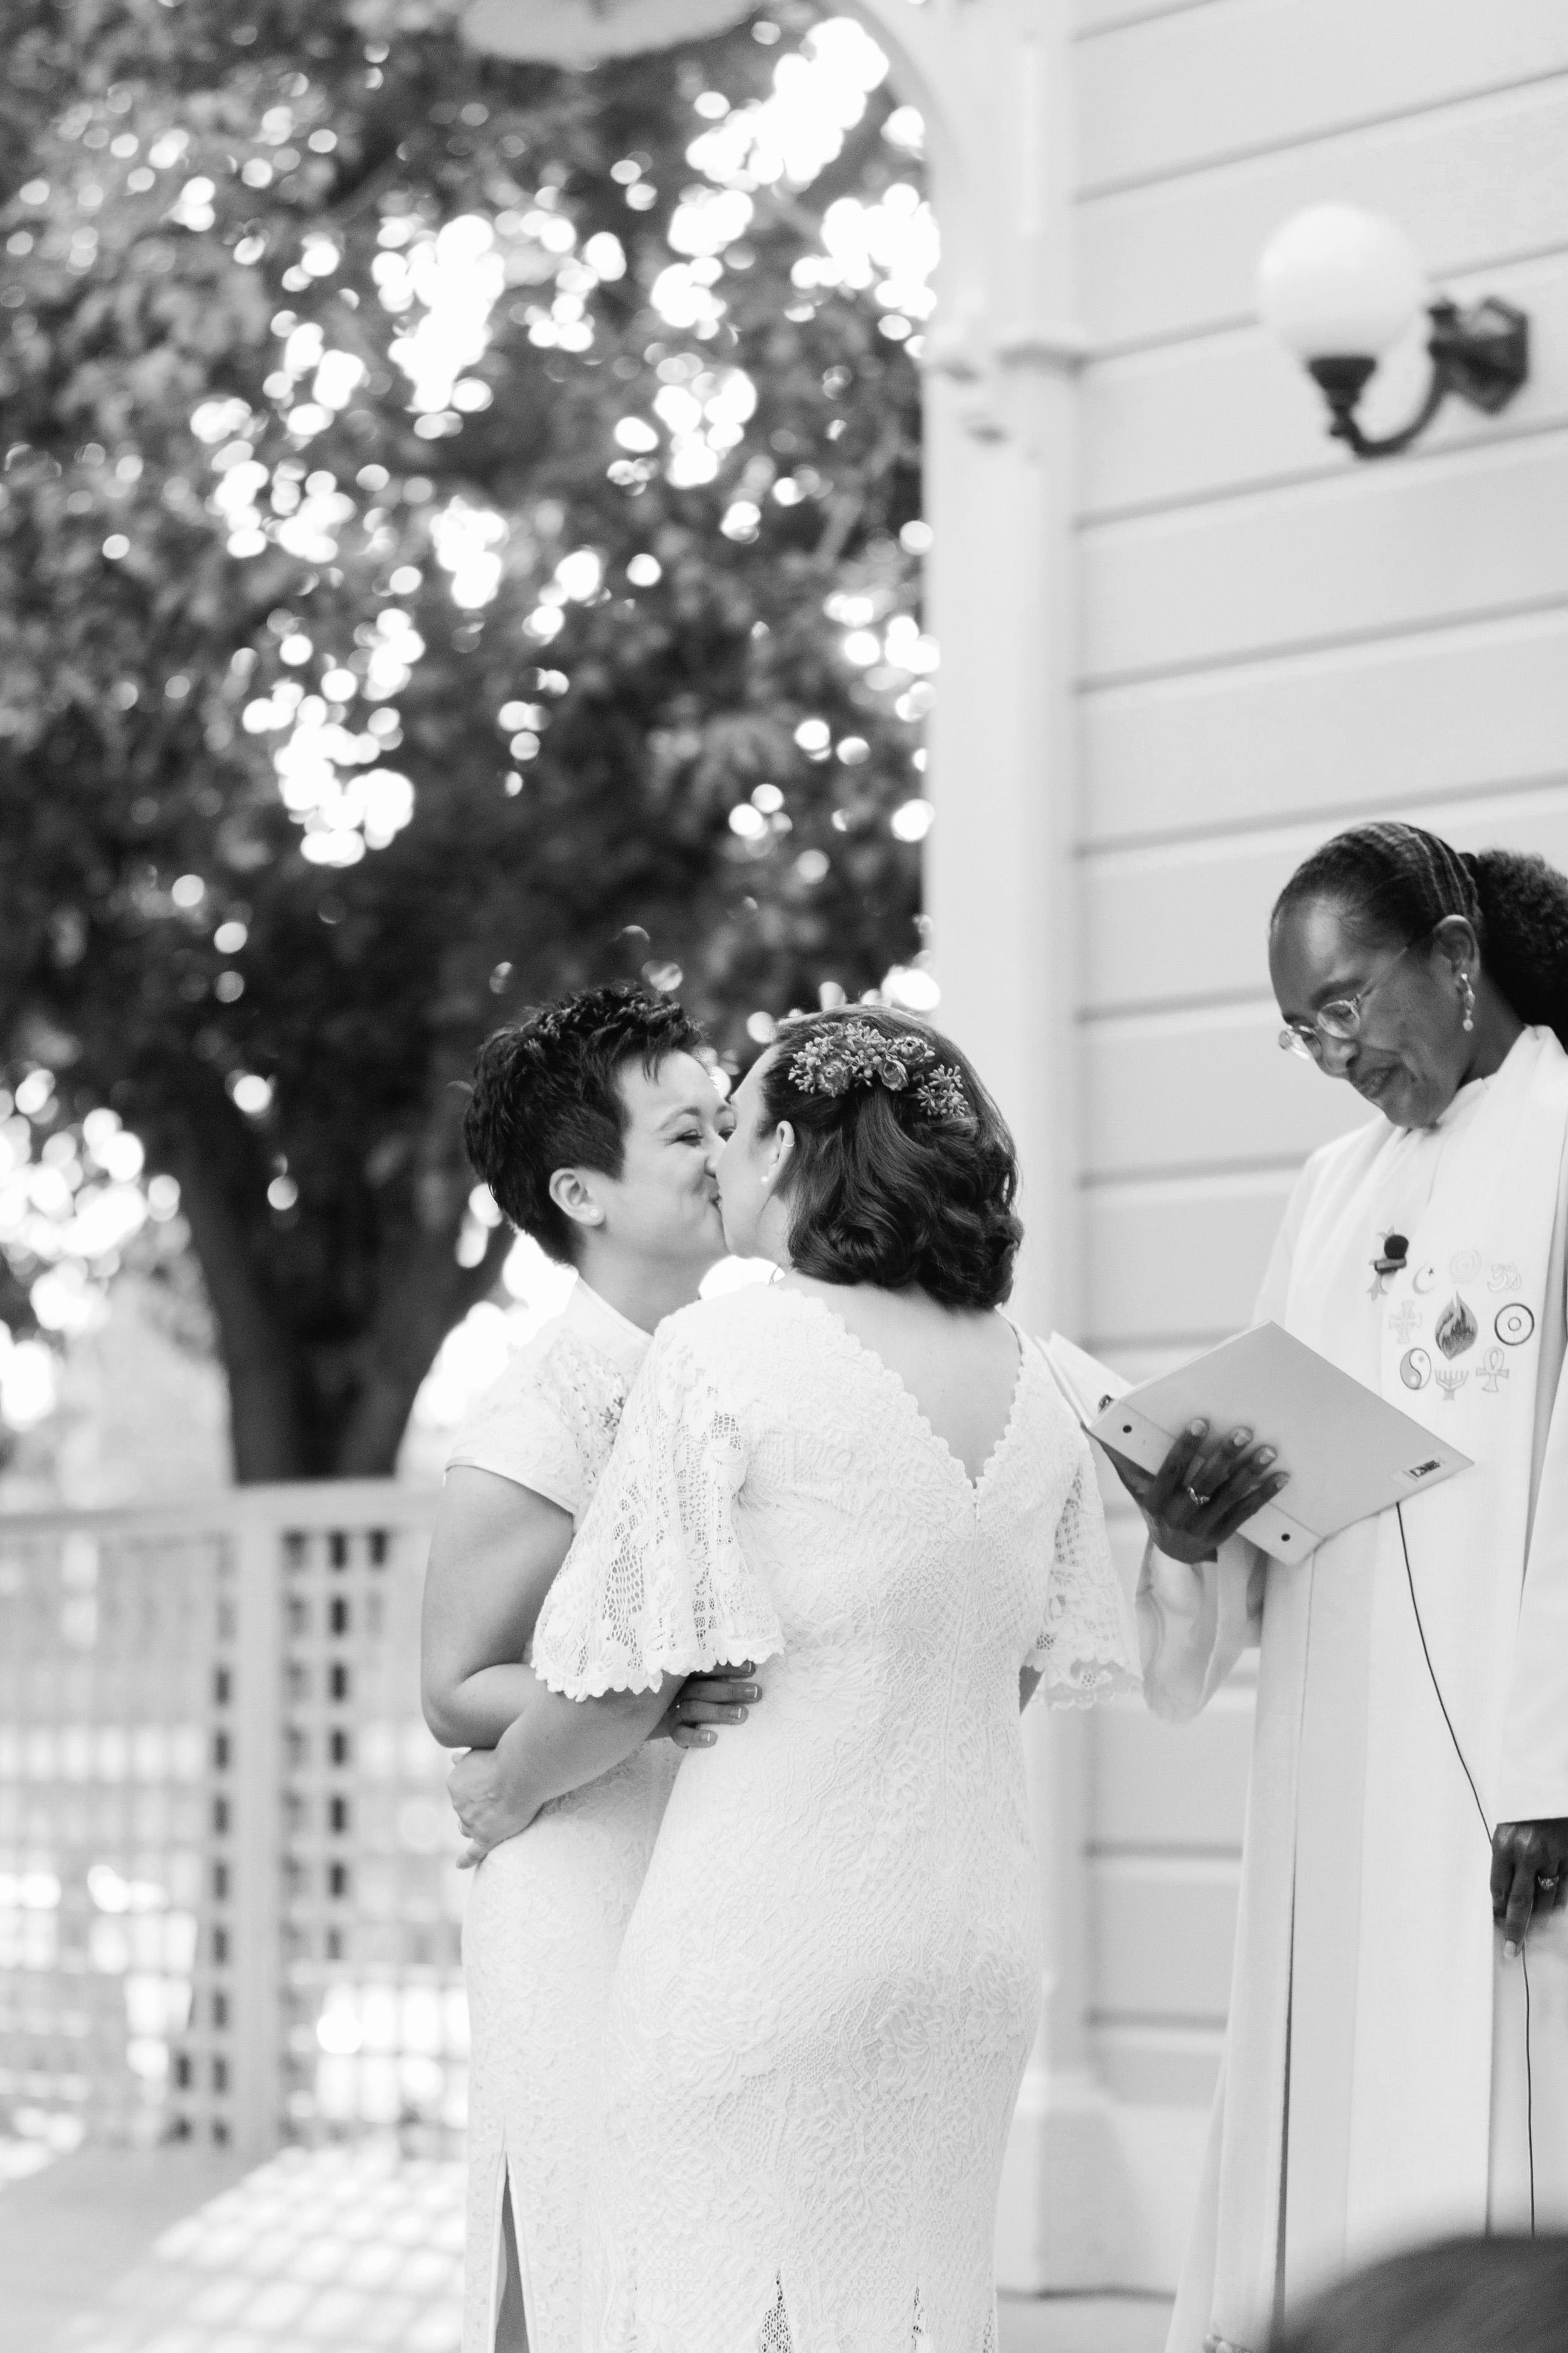 Oakland-Preservation-Park-Wedding-031.JPG